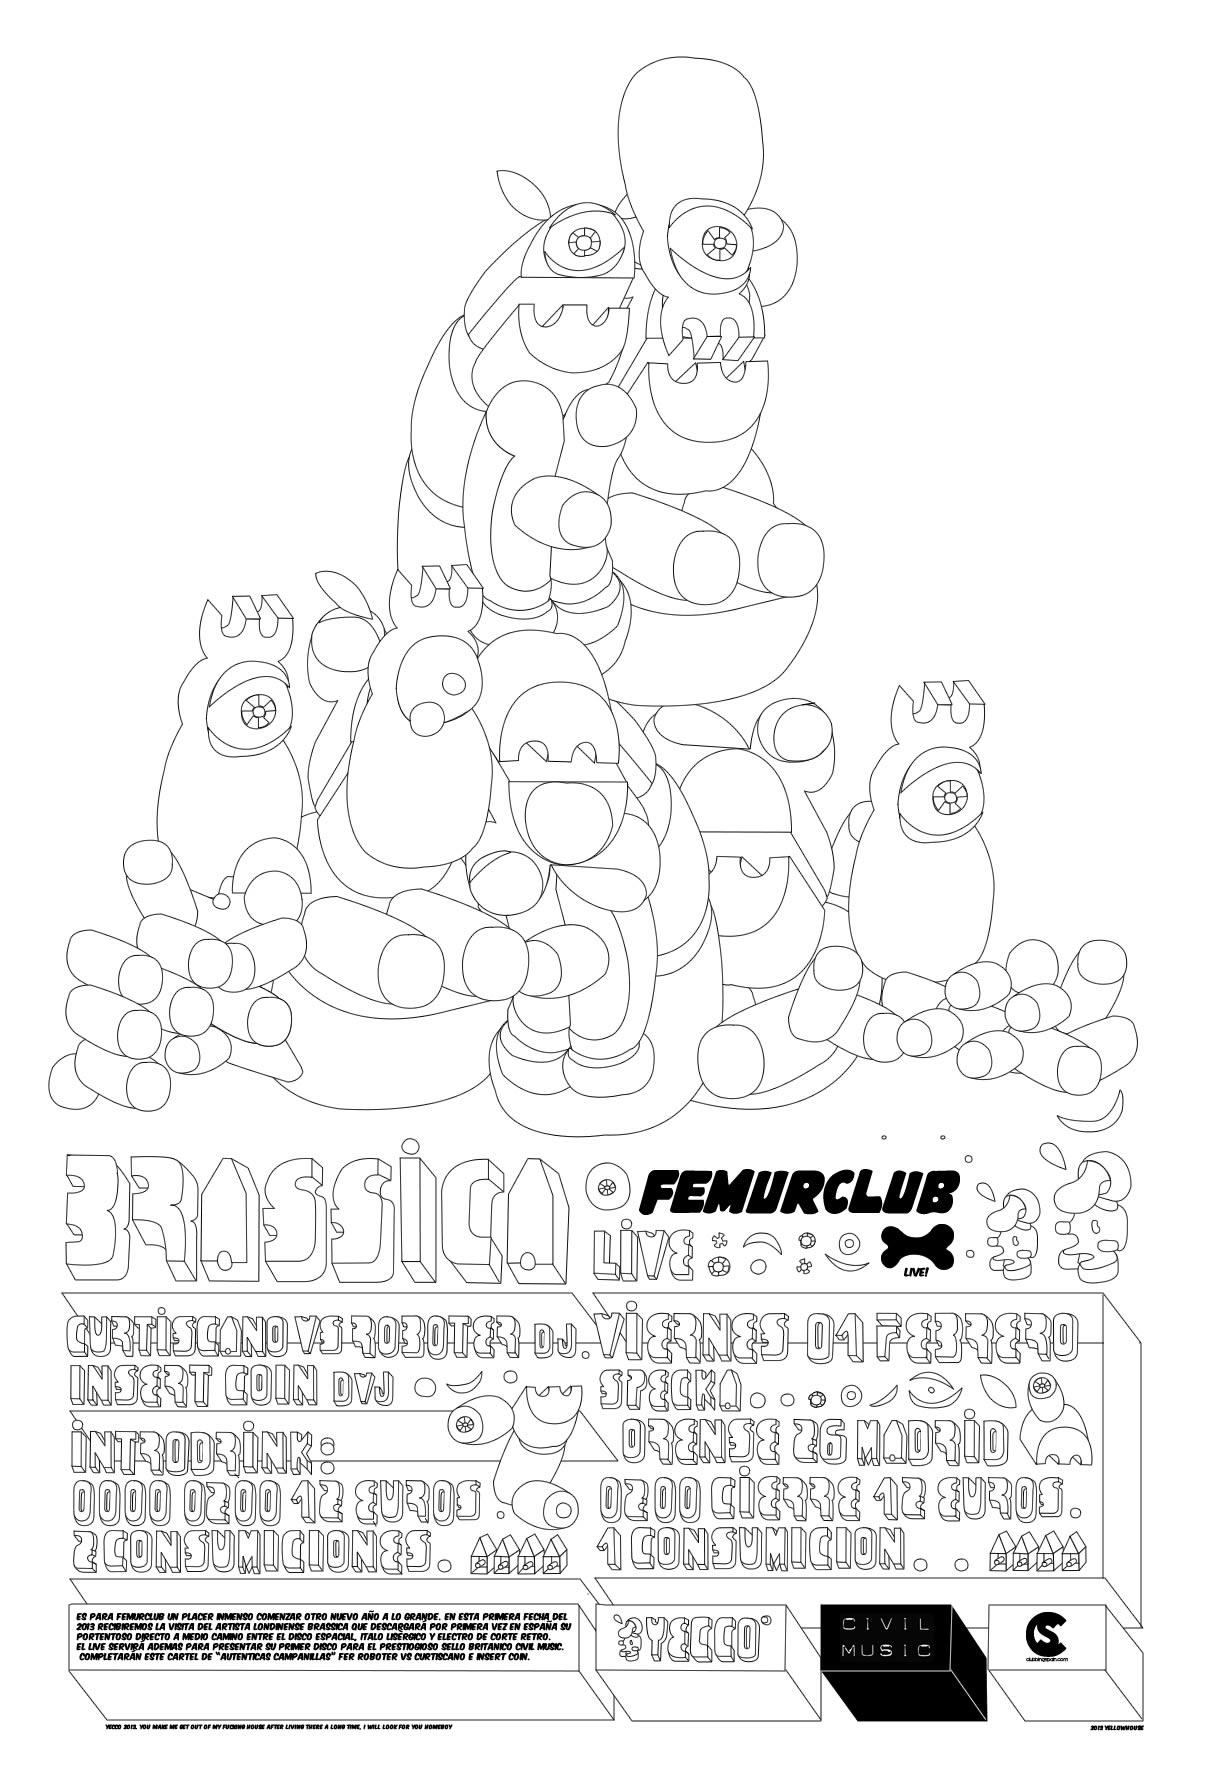 BRASSICA LIVE FEMURCLUB 01.02.2013 Brassicalong